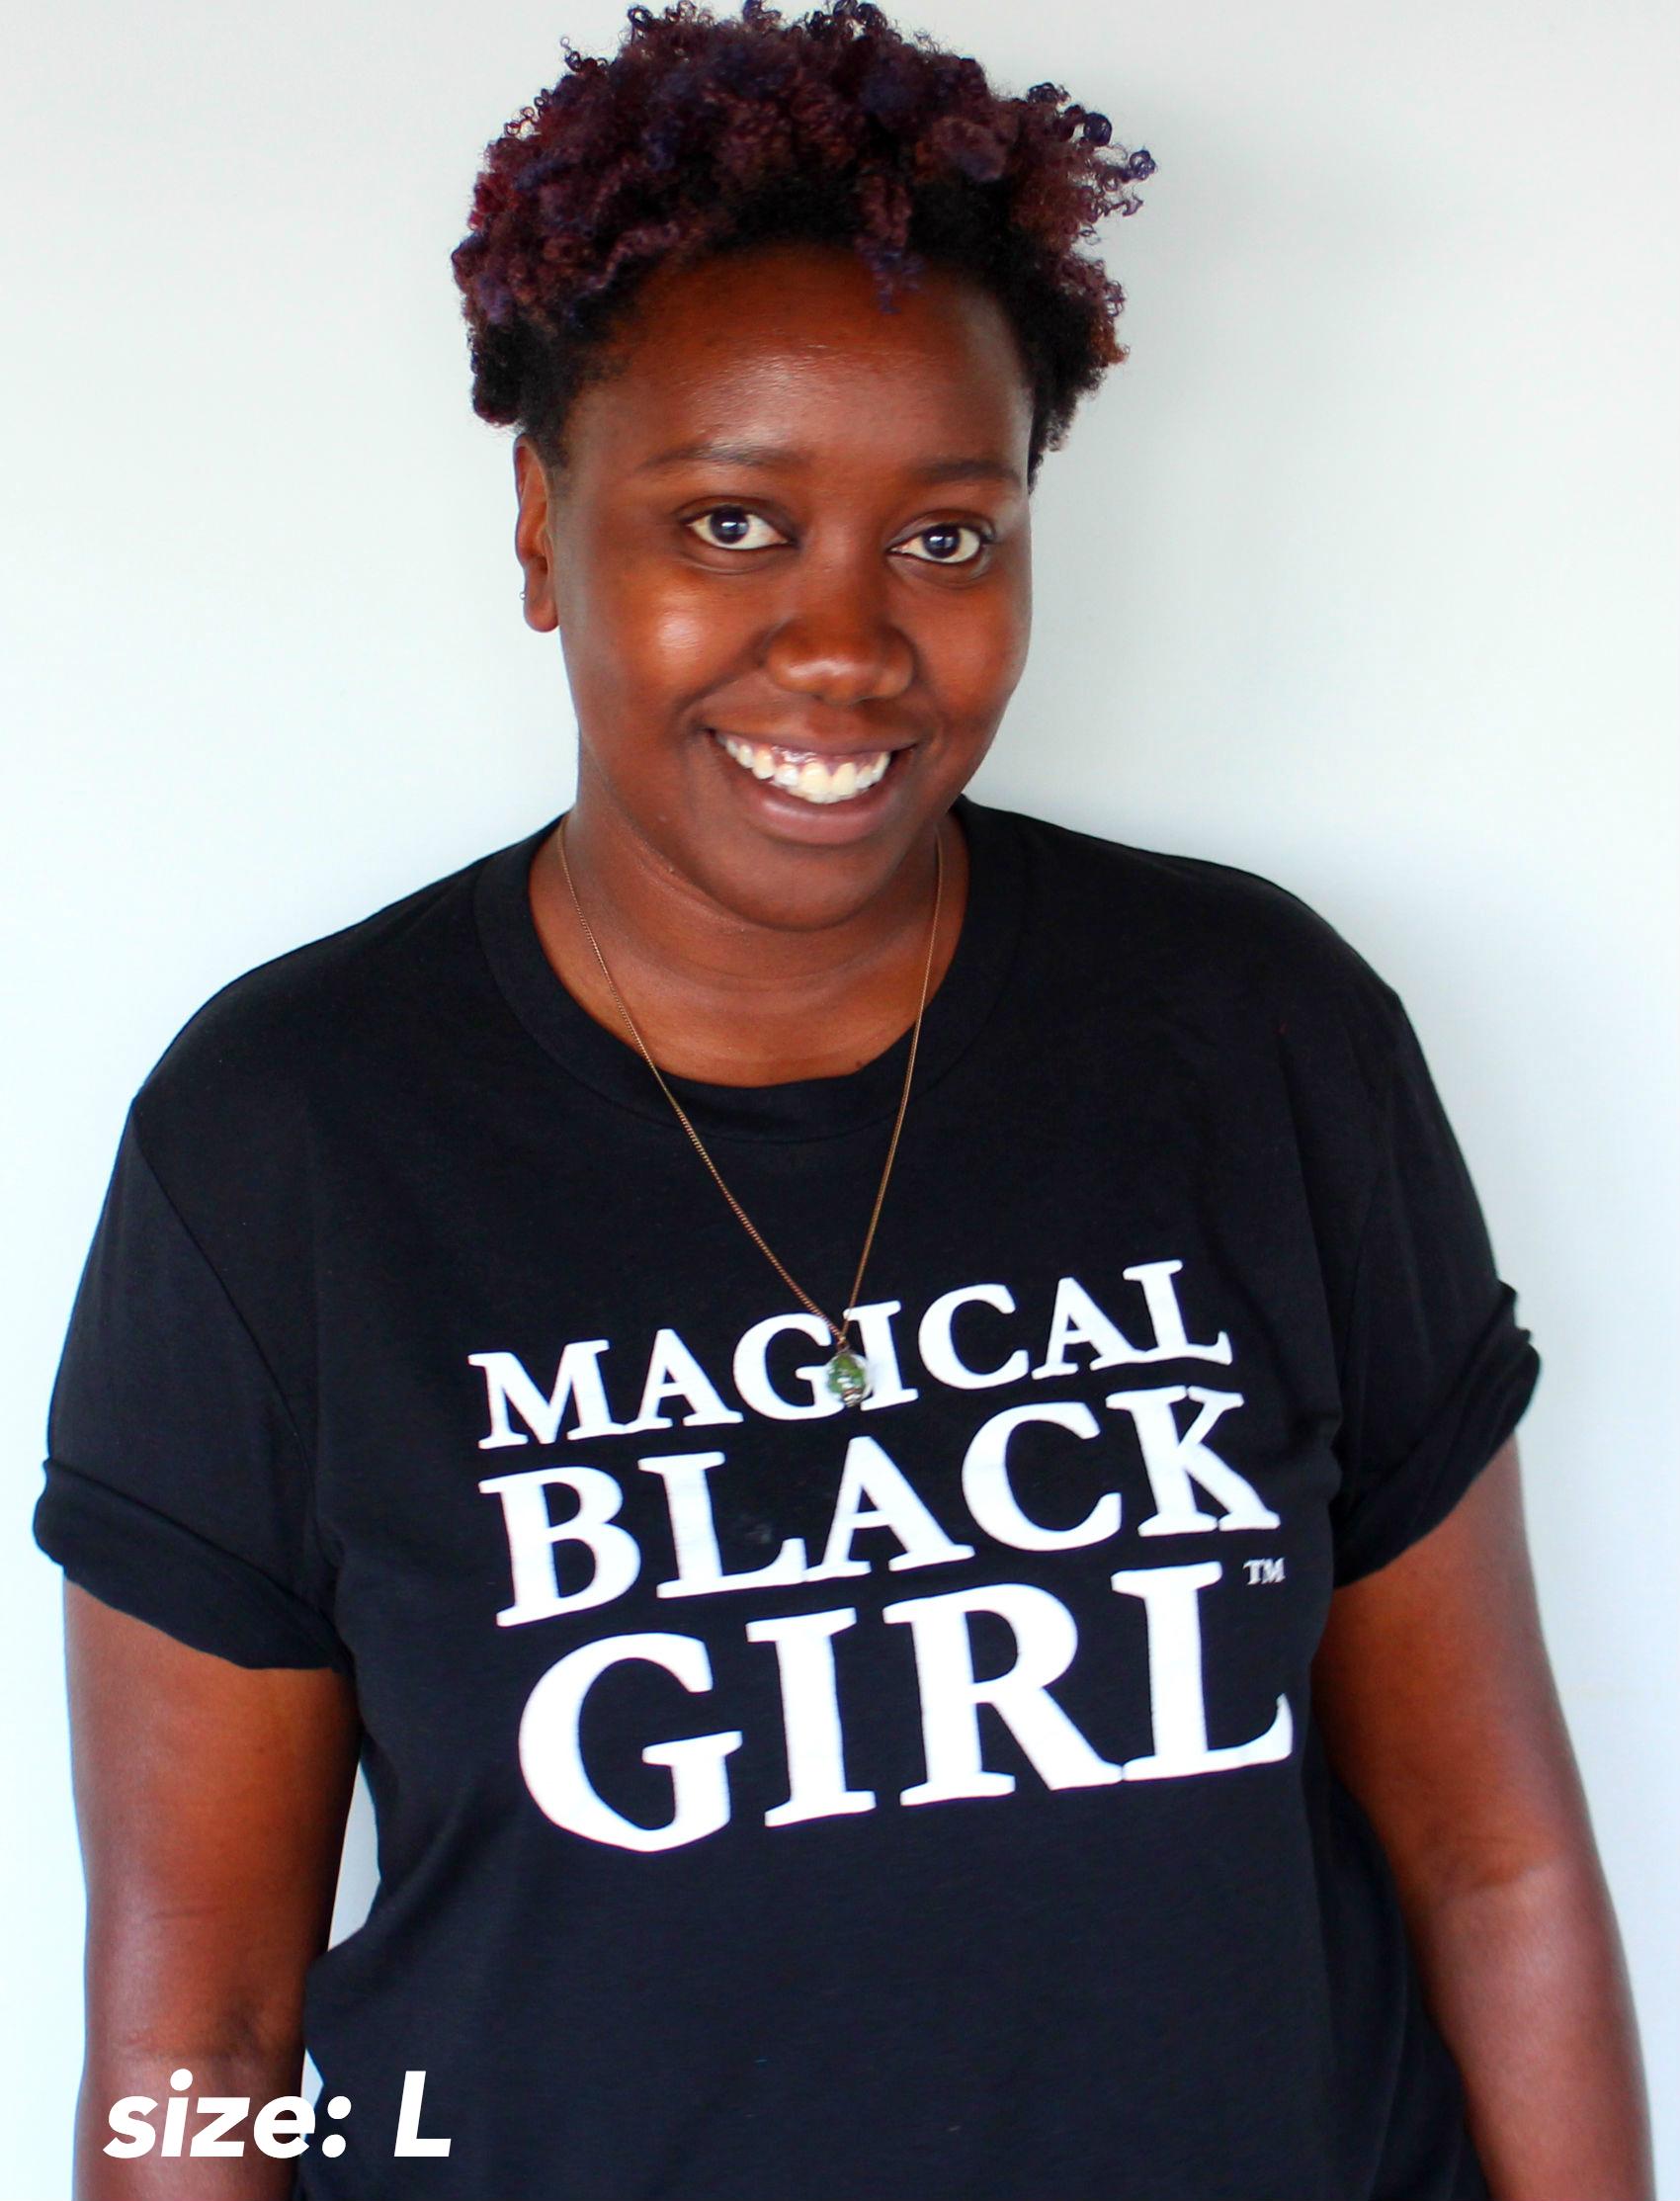 Black t shirt on girl -  Preorder Magical Black Girl T Shirt Usa Shipping Only